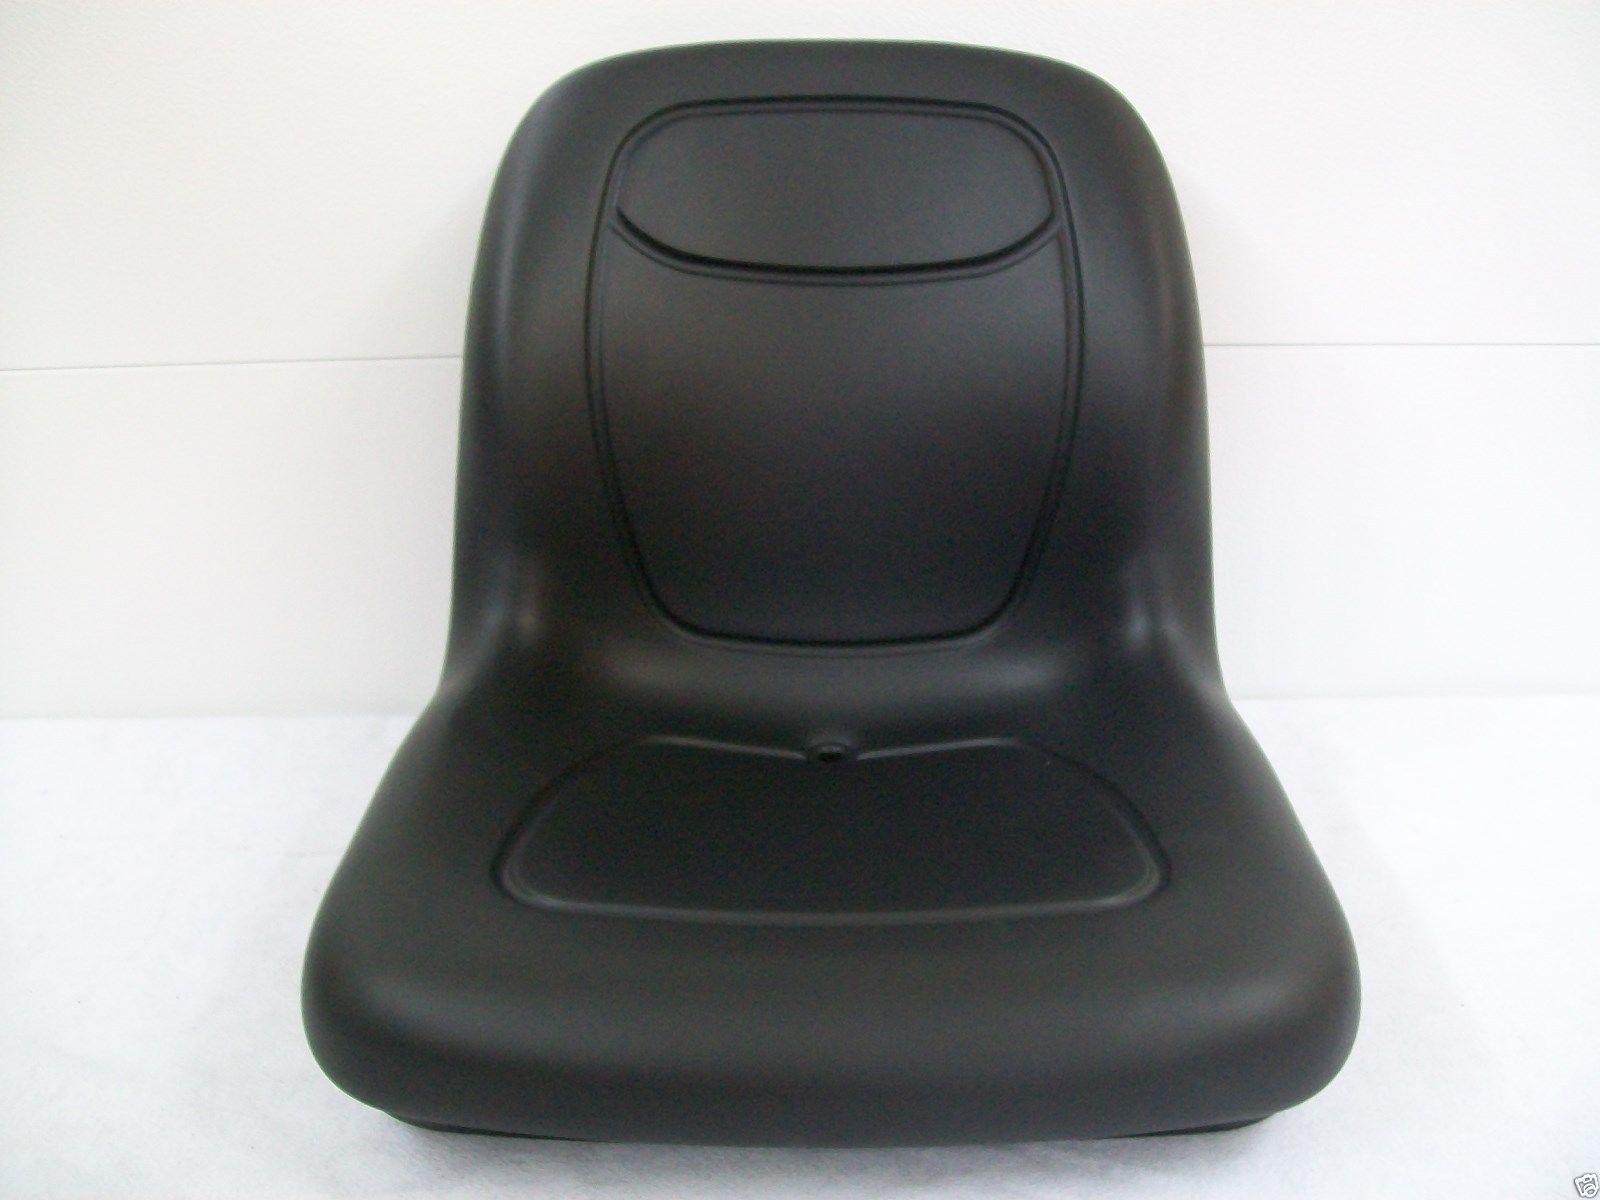 SEAT FITS KUBOTA BX1500, BX1800, BX2200, BX2230 COMPACT TRACTORS, BX22,  BX23 BACKHOE #HO